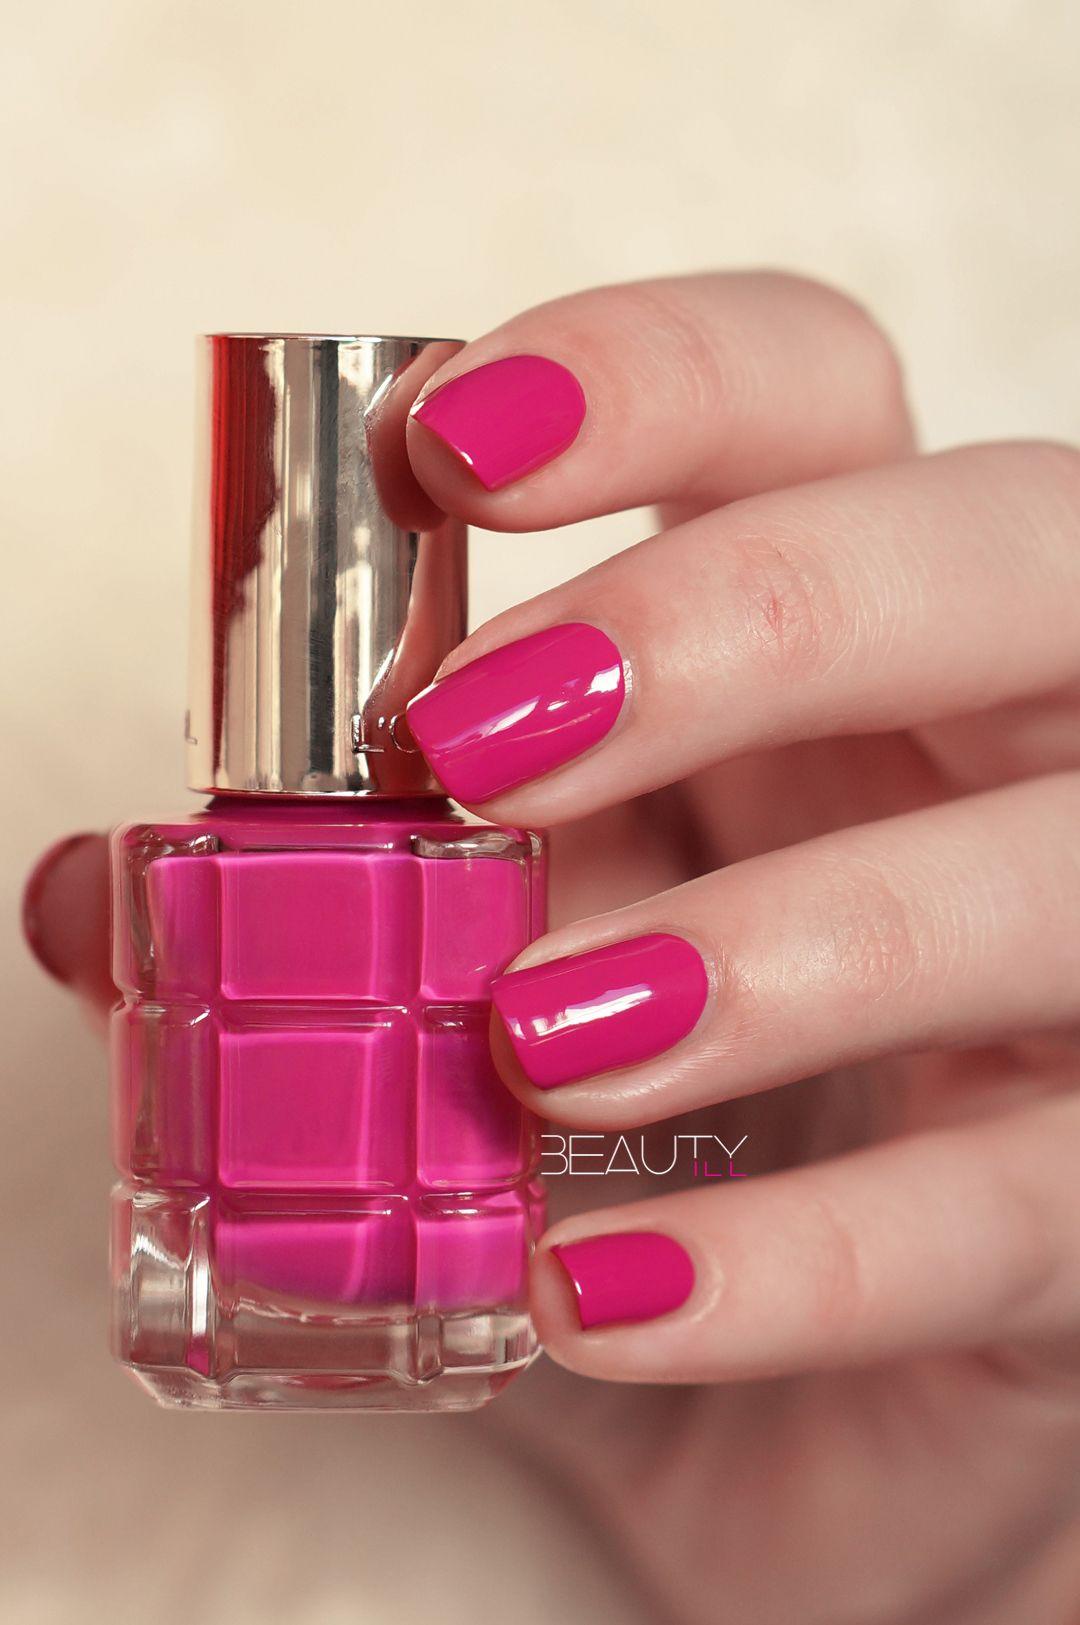 L Oreal Paris Color Riche Oil Infused Nagellak Loreal Nail Polish Nail Polish Paris Nails